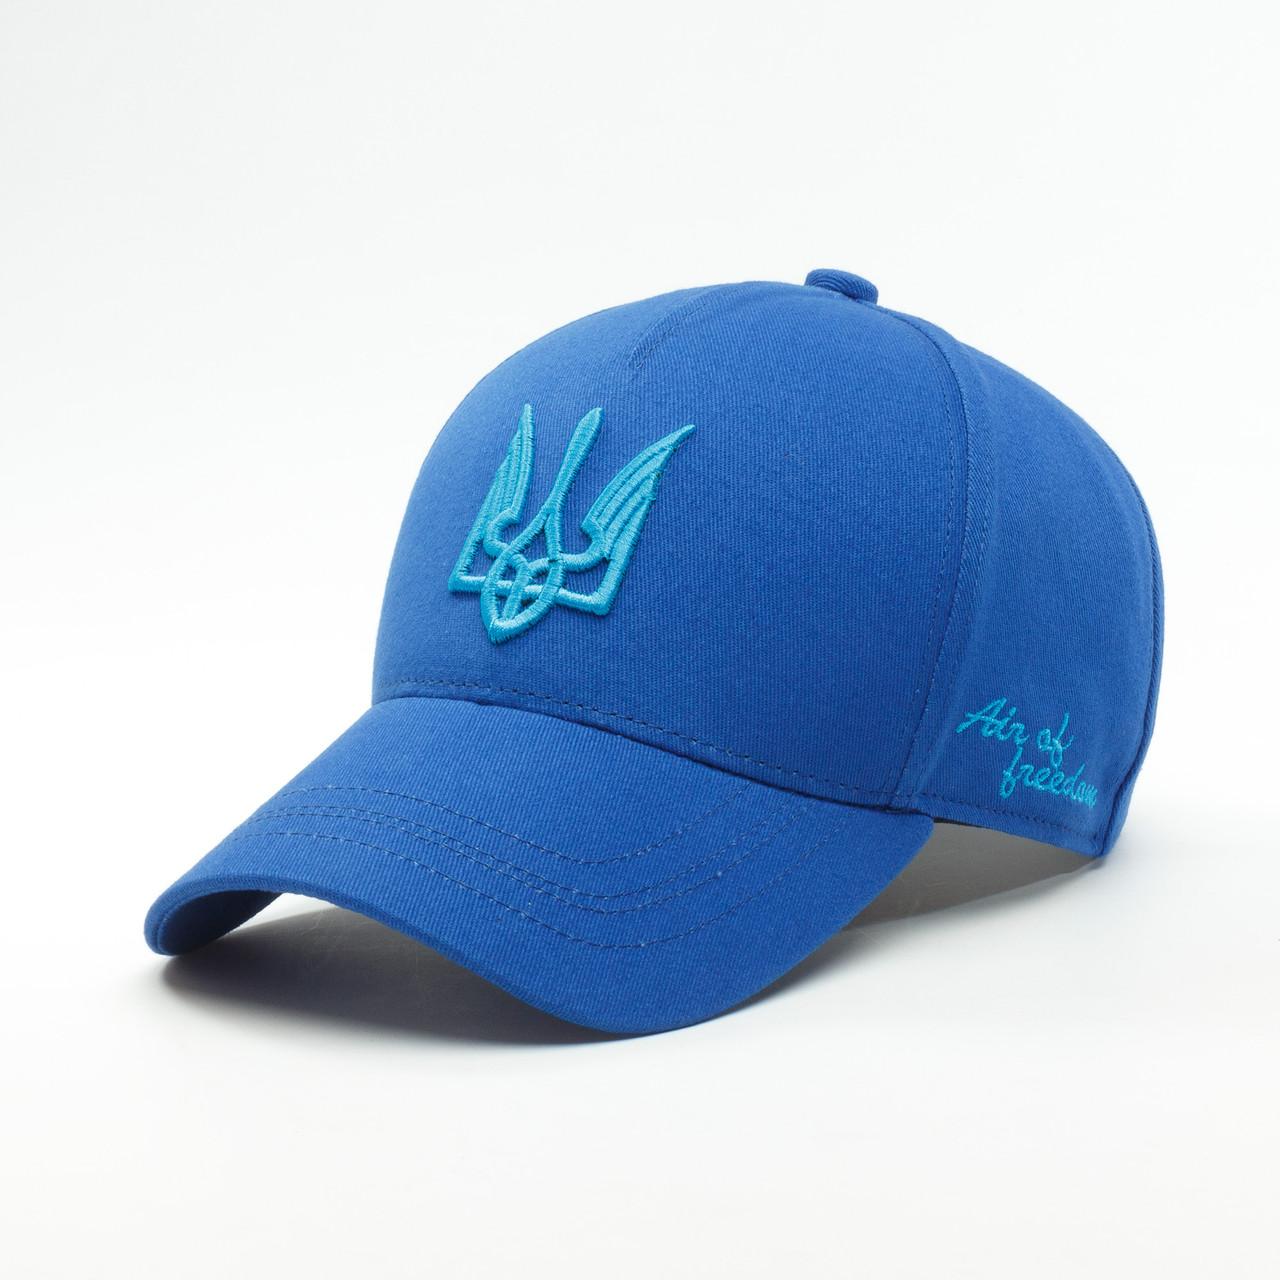 Купить Кепка бейсболка мужская INAL air of freedom S / 53-54 RU Cиний 36153